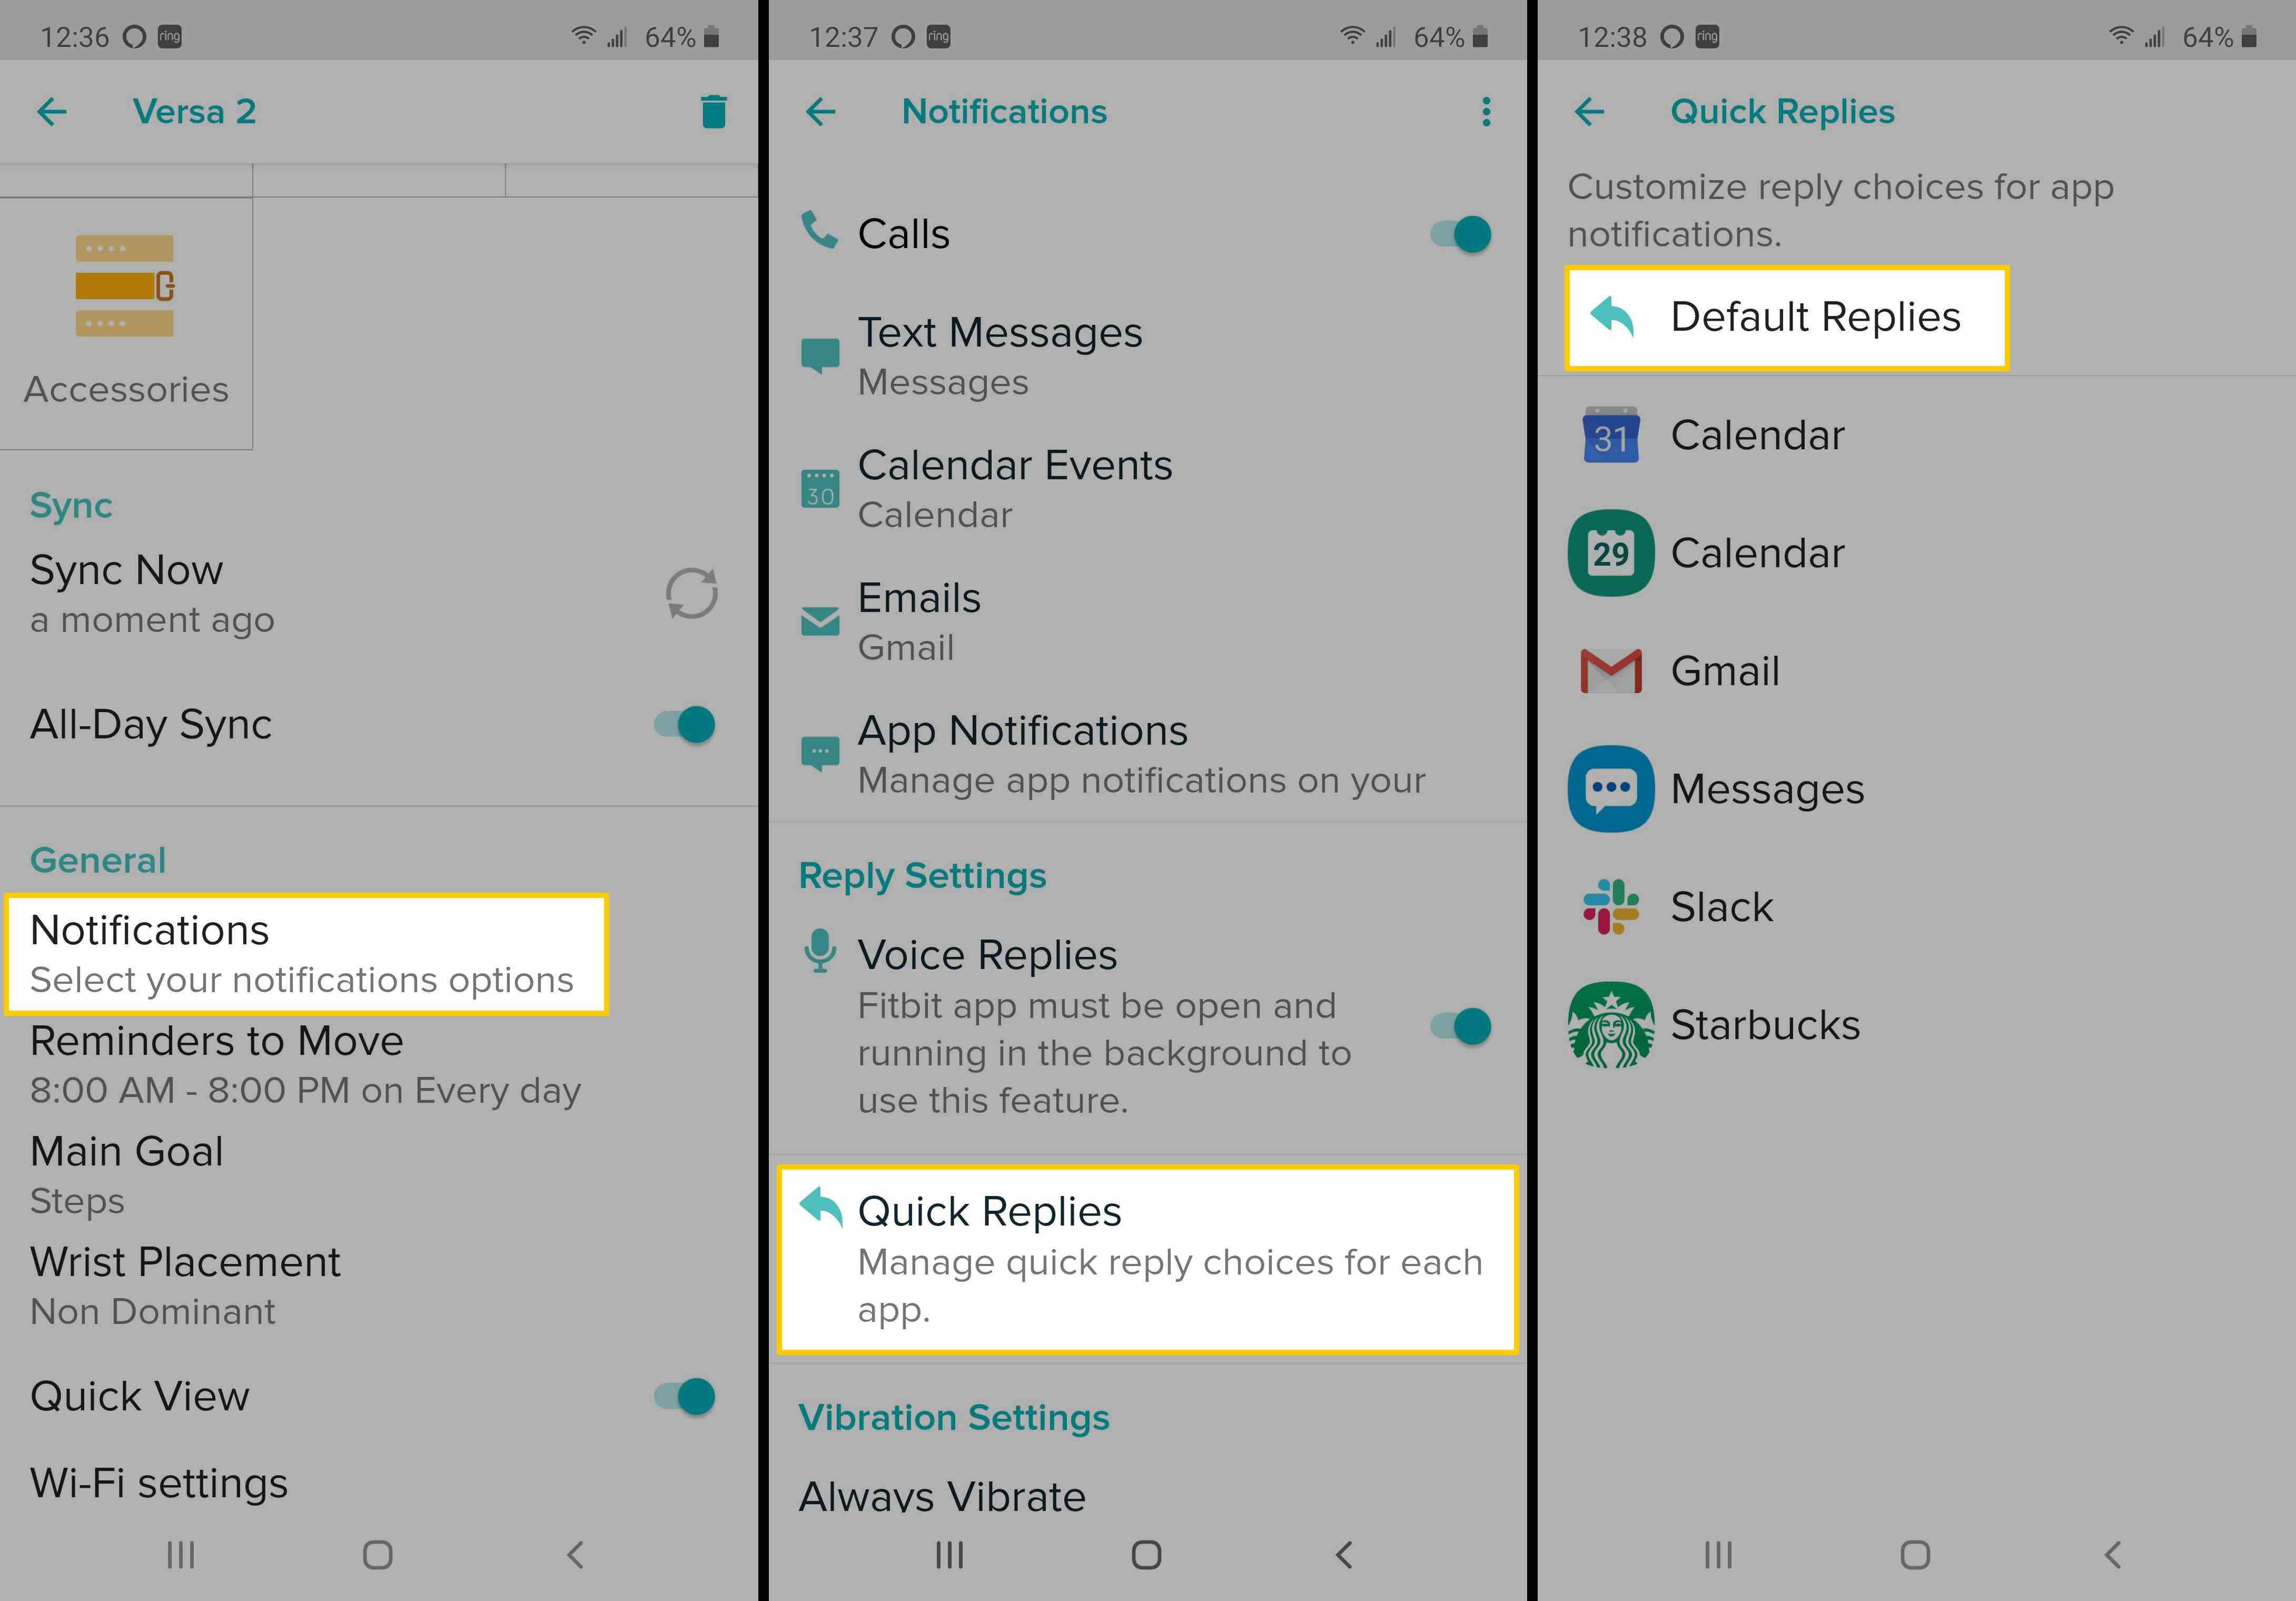 Screenshots showing the Default Replies option on Fitbit App.